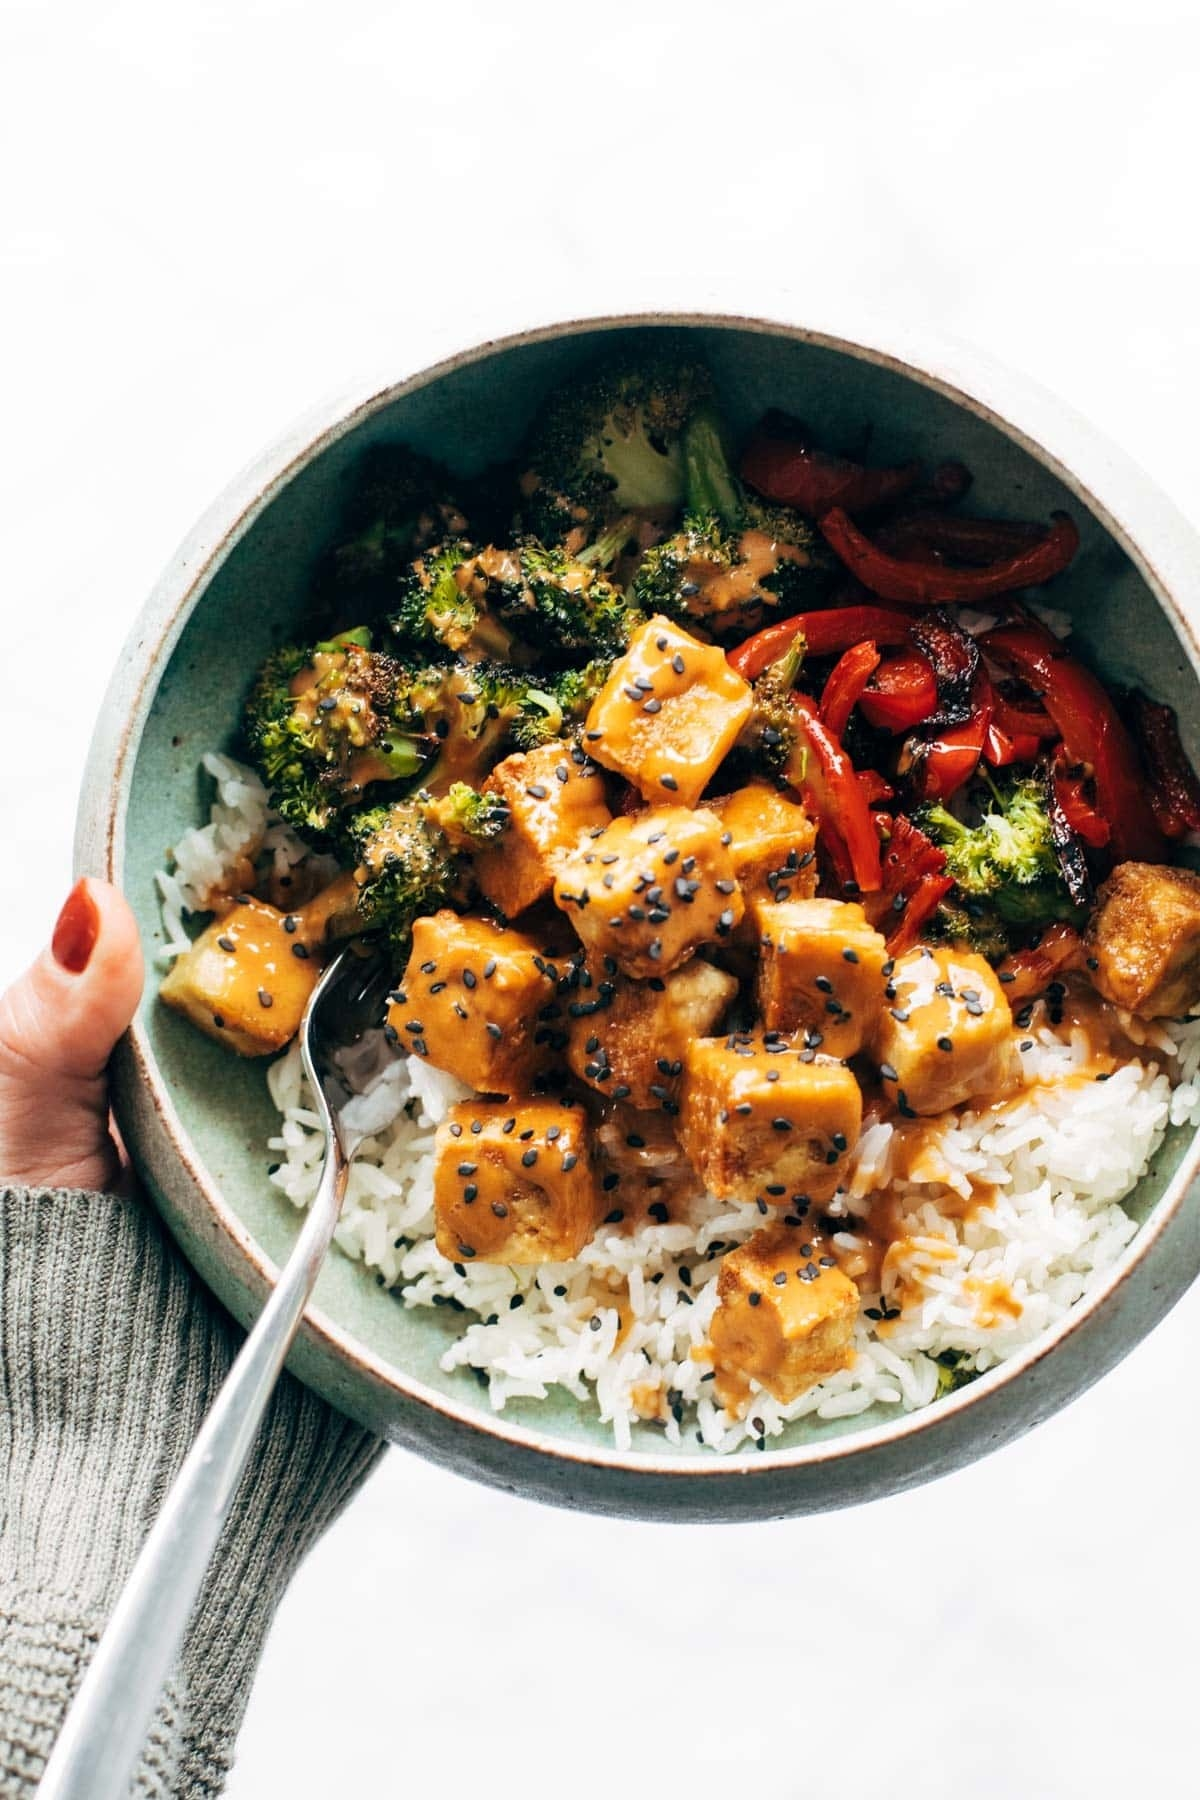 Spicy peanut tofu bowls